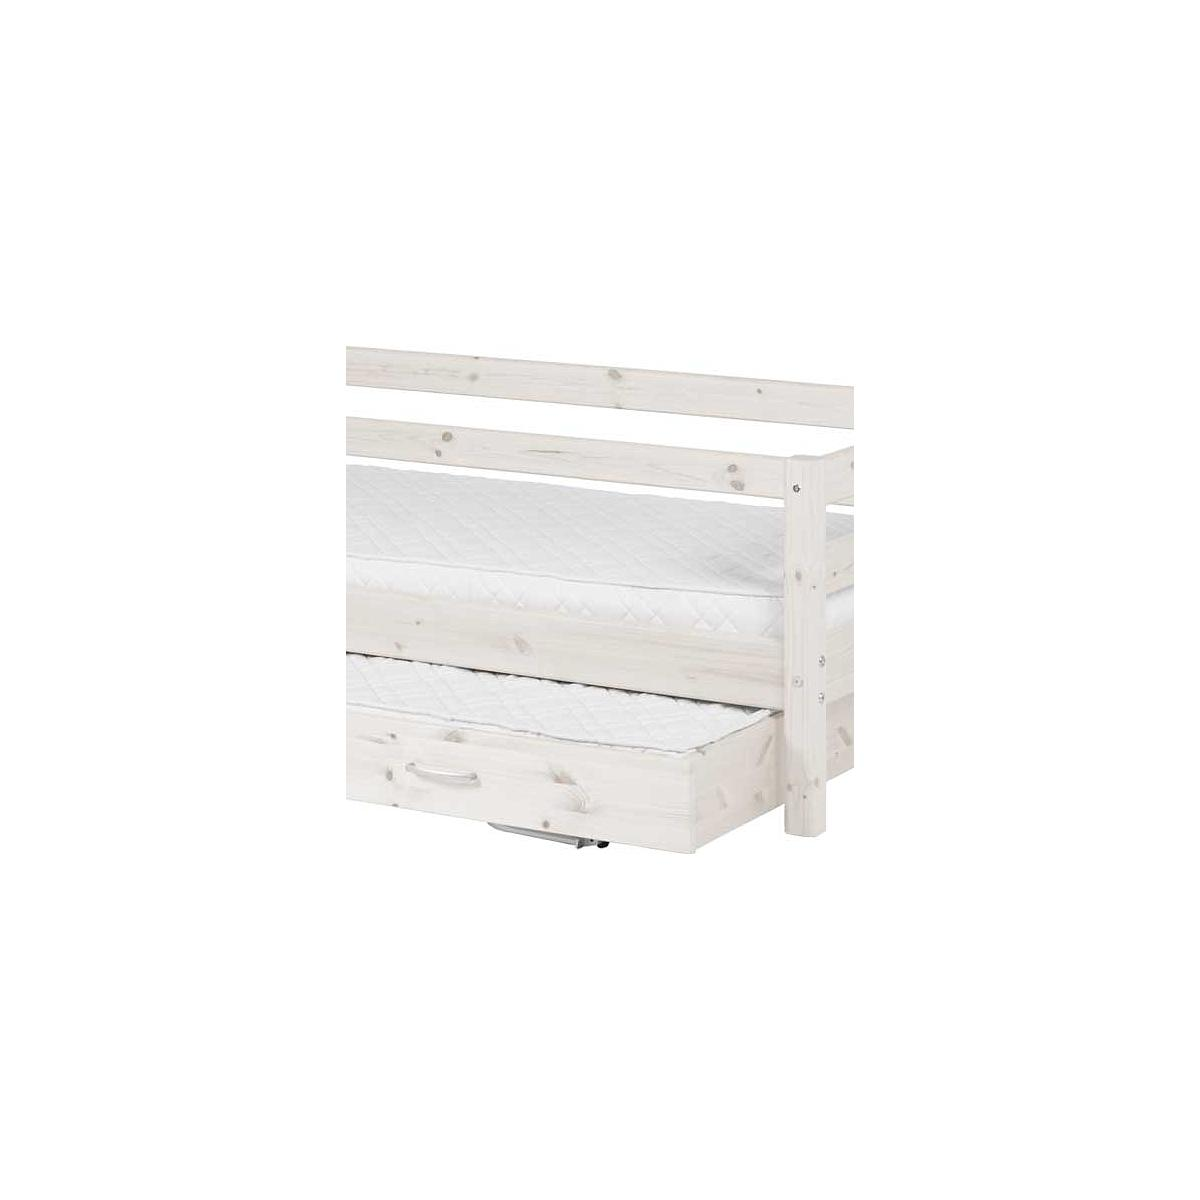 Sofá Cama nido 90x190 CLASSIC Flexa blanco cal